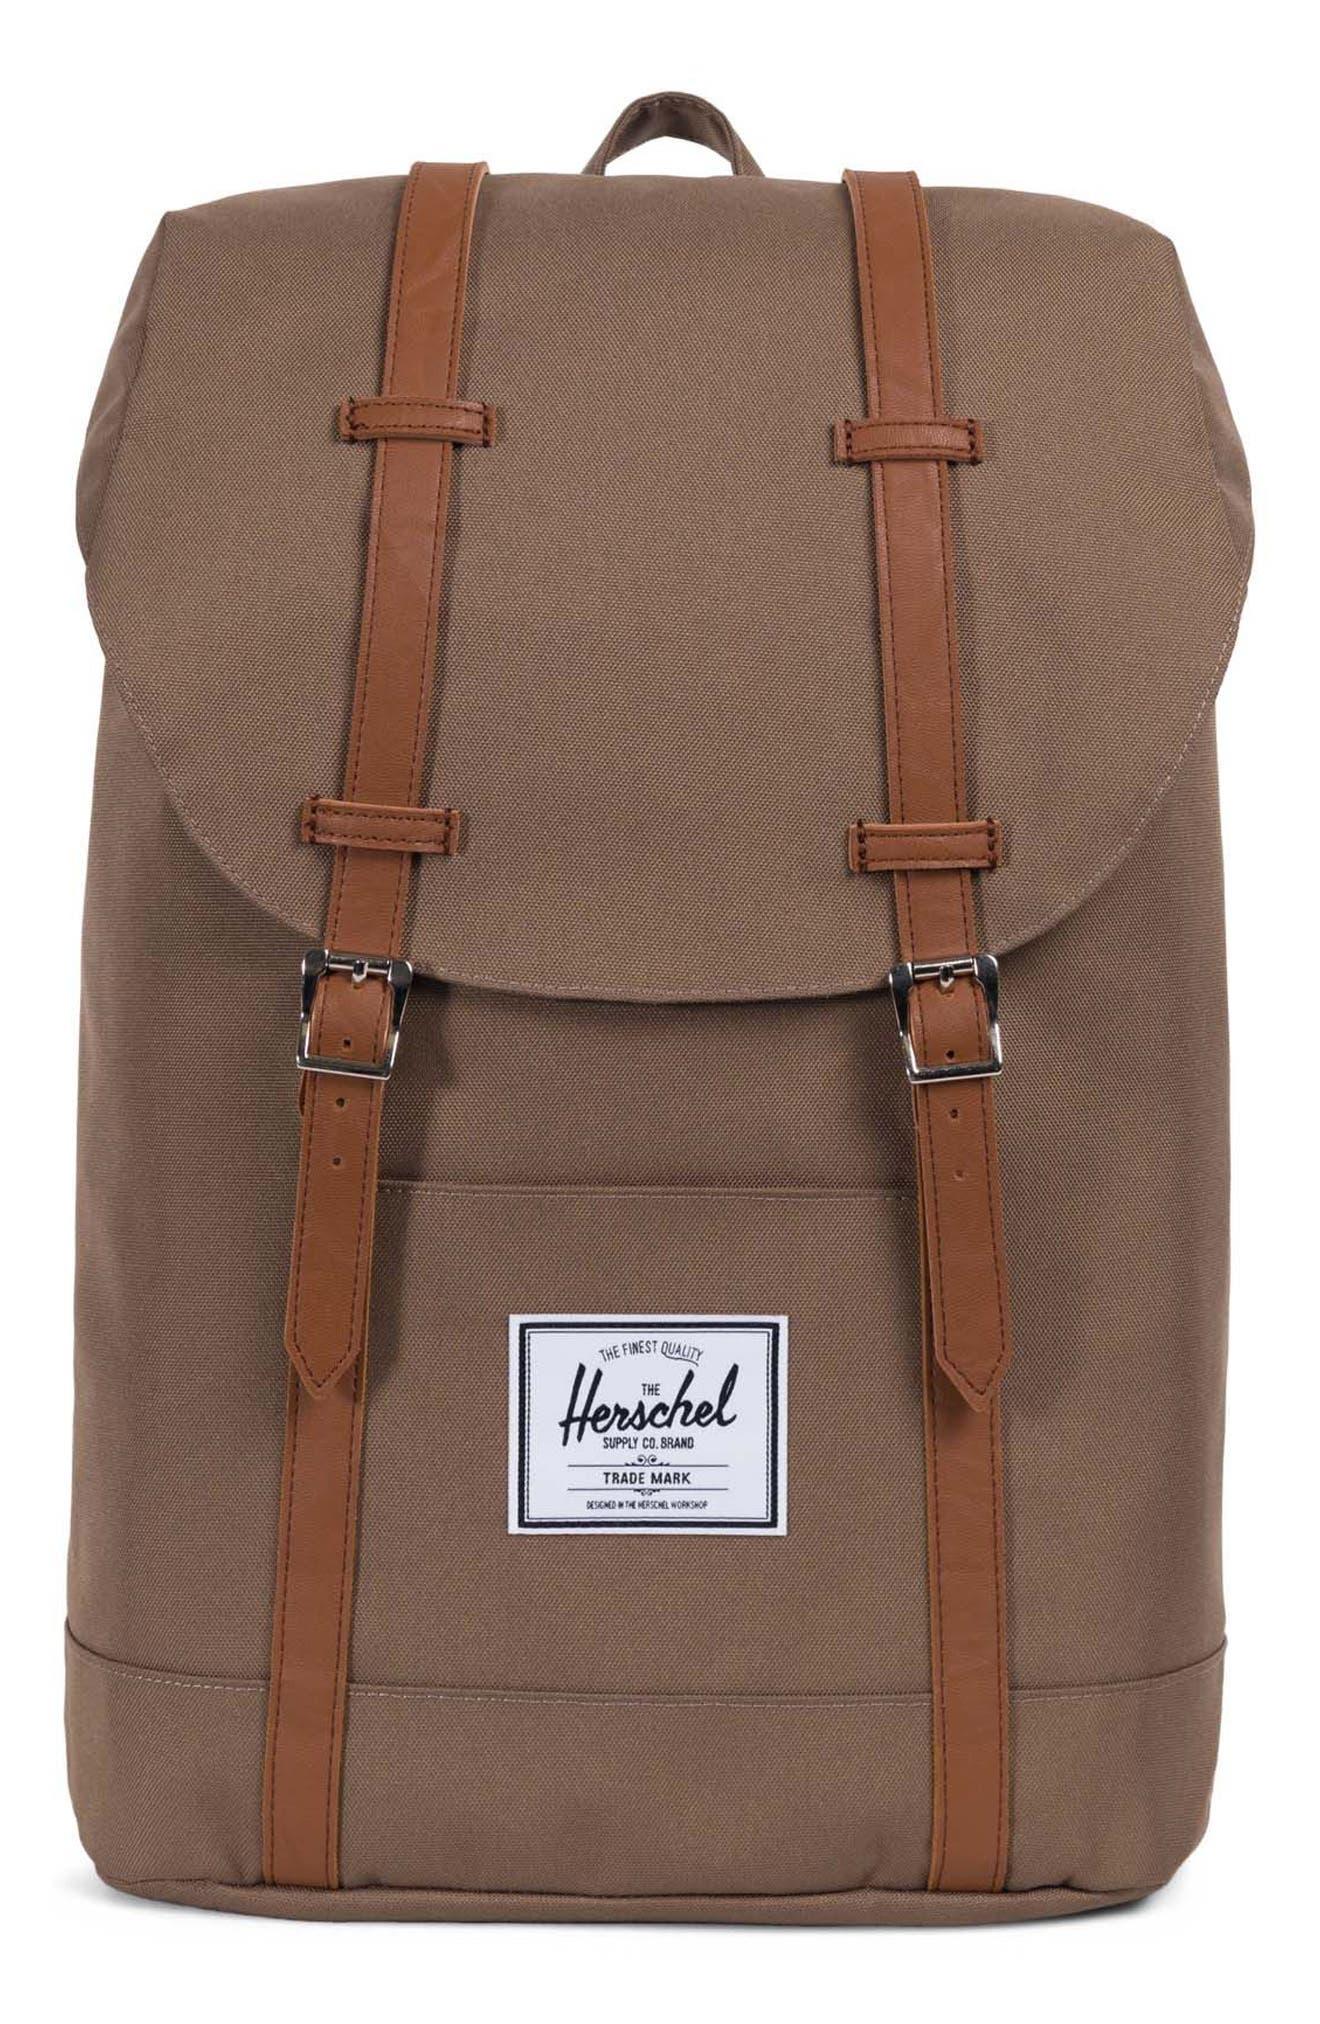 fc8c8fb29c2d Herschel Supply Co.  Retreat  Backpack - Brown In Cub Tan